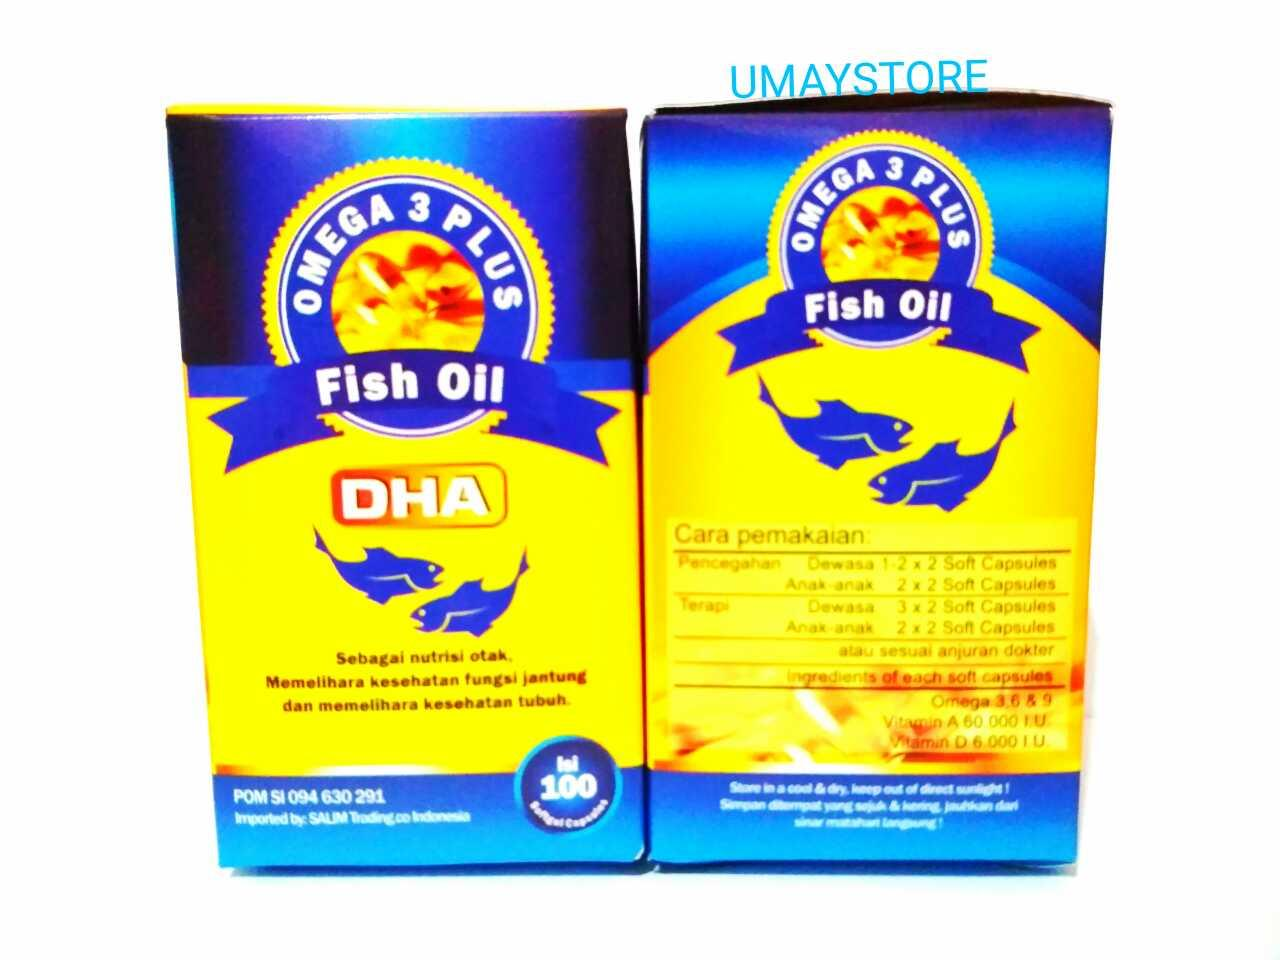 Minyak Ikan Fish Oil Omega 3 Vitamin A D Untukanak Dan Scotts Emulsion Original Dengan 400ml 2pcs Plus Dha 100 Kapsul